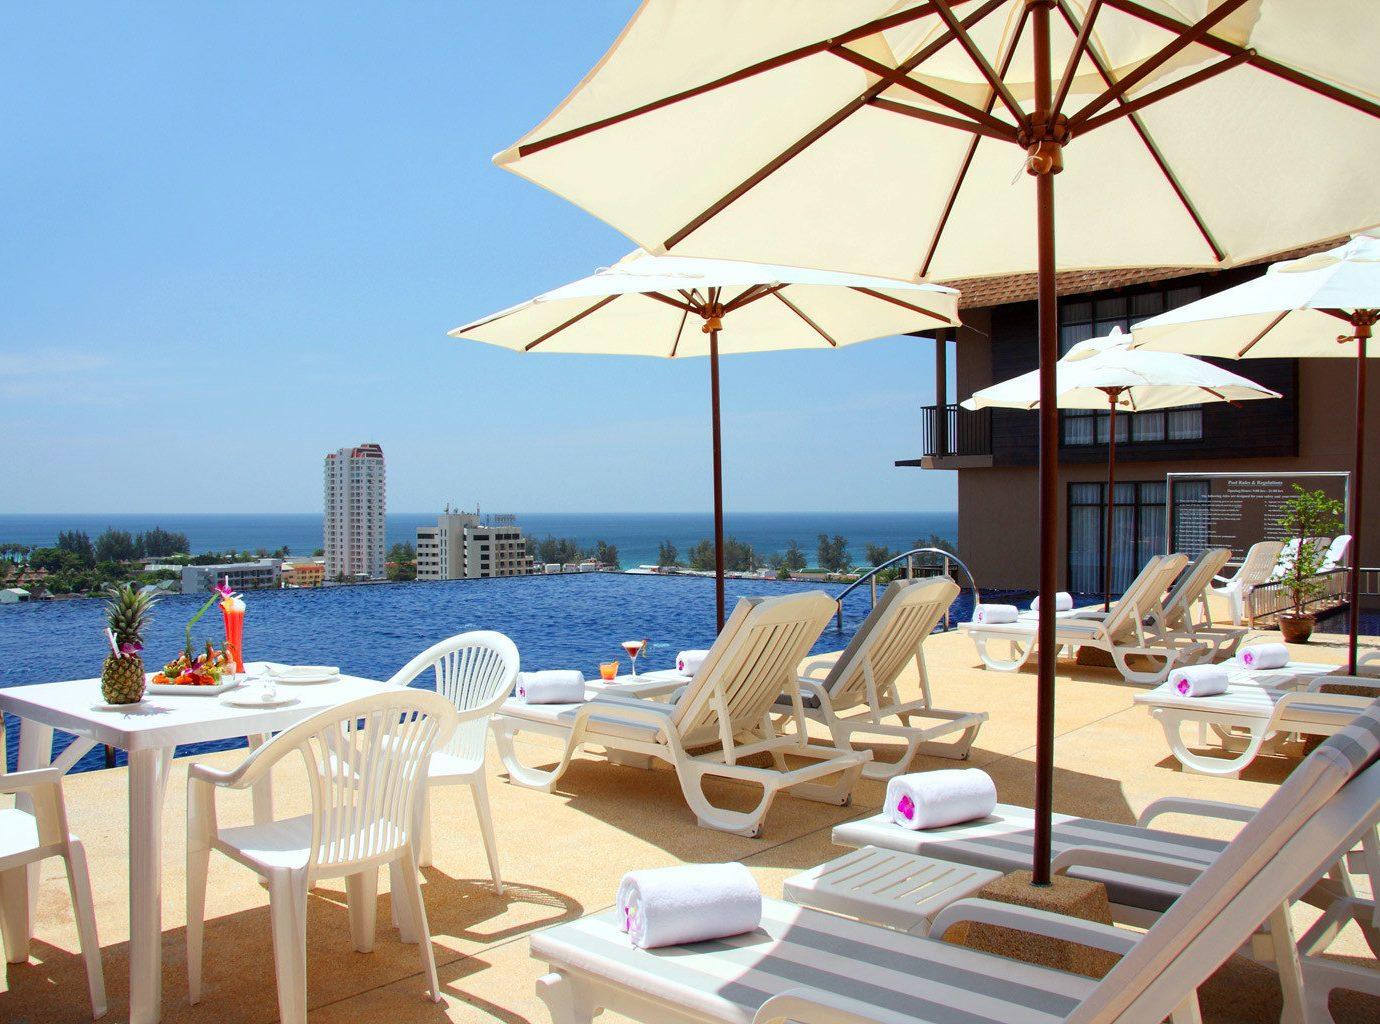 B&B Beachfront Deck Pool Scenic views sky chair restaurant Resort Villa cottage set day